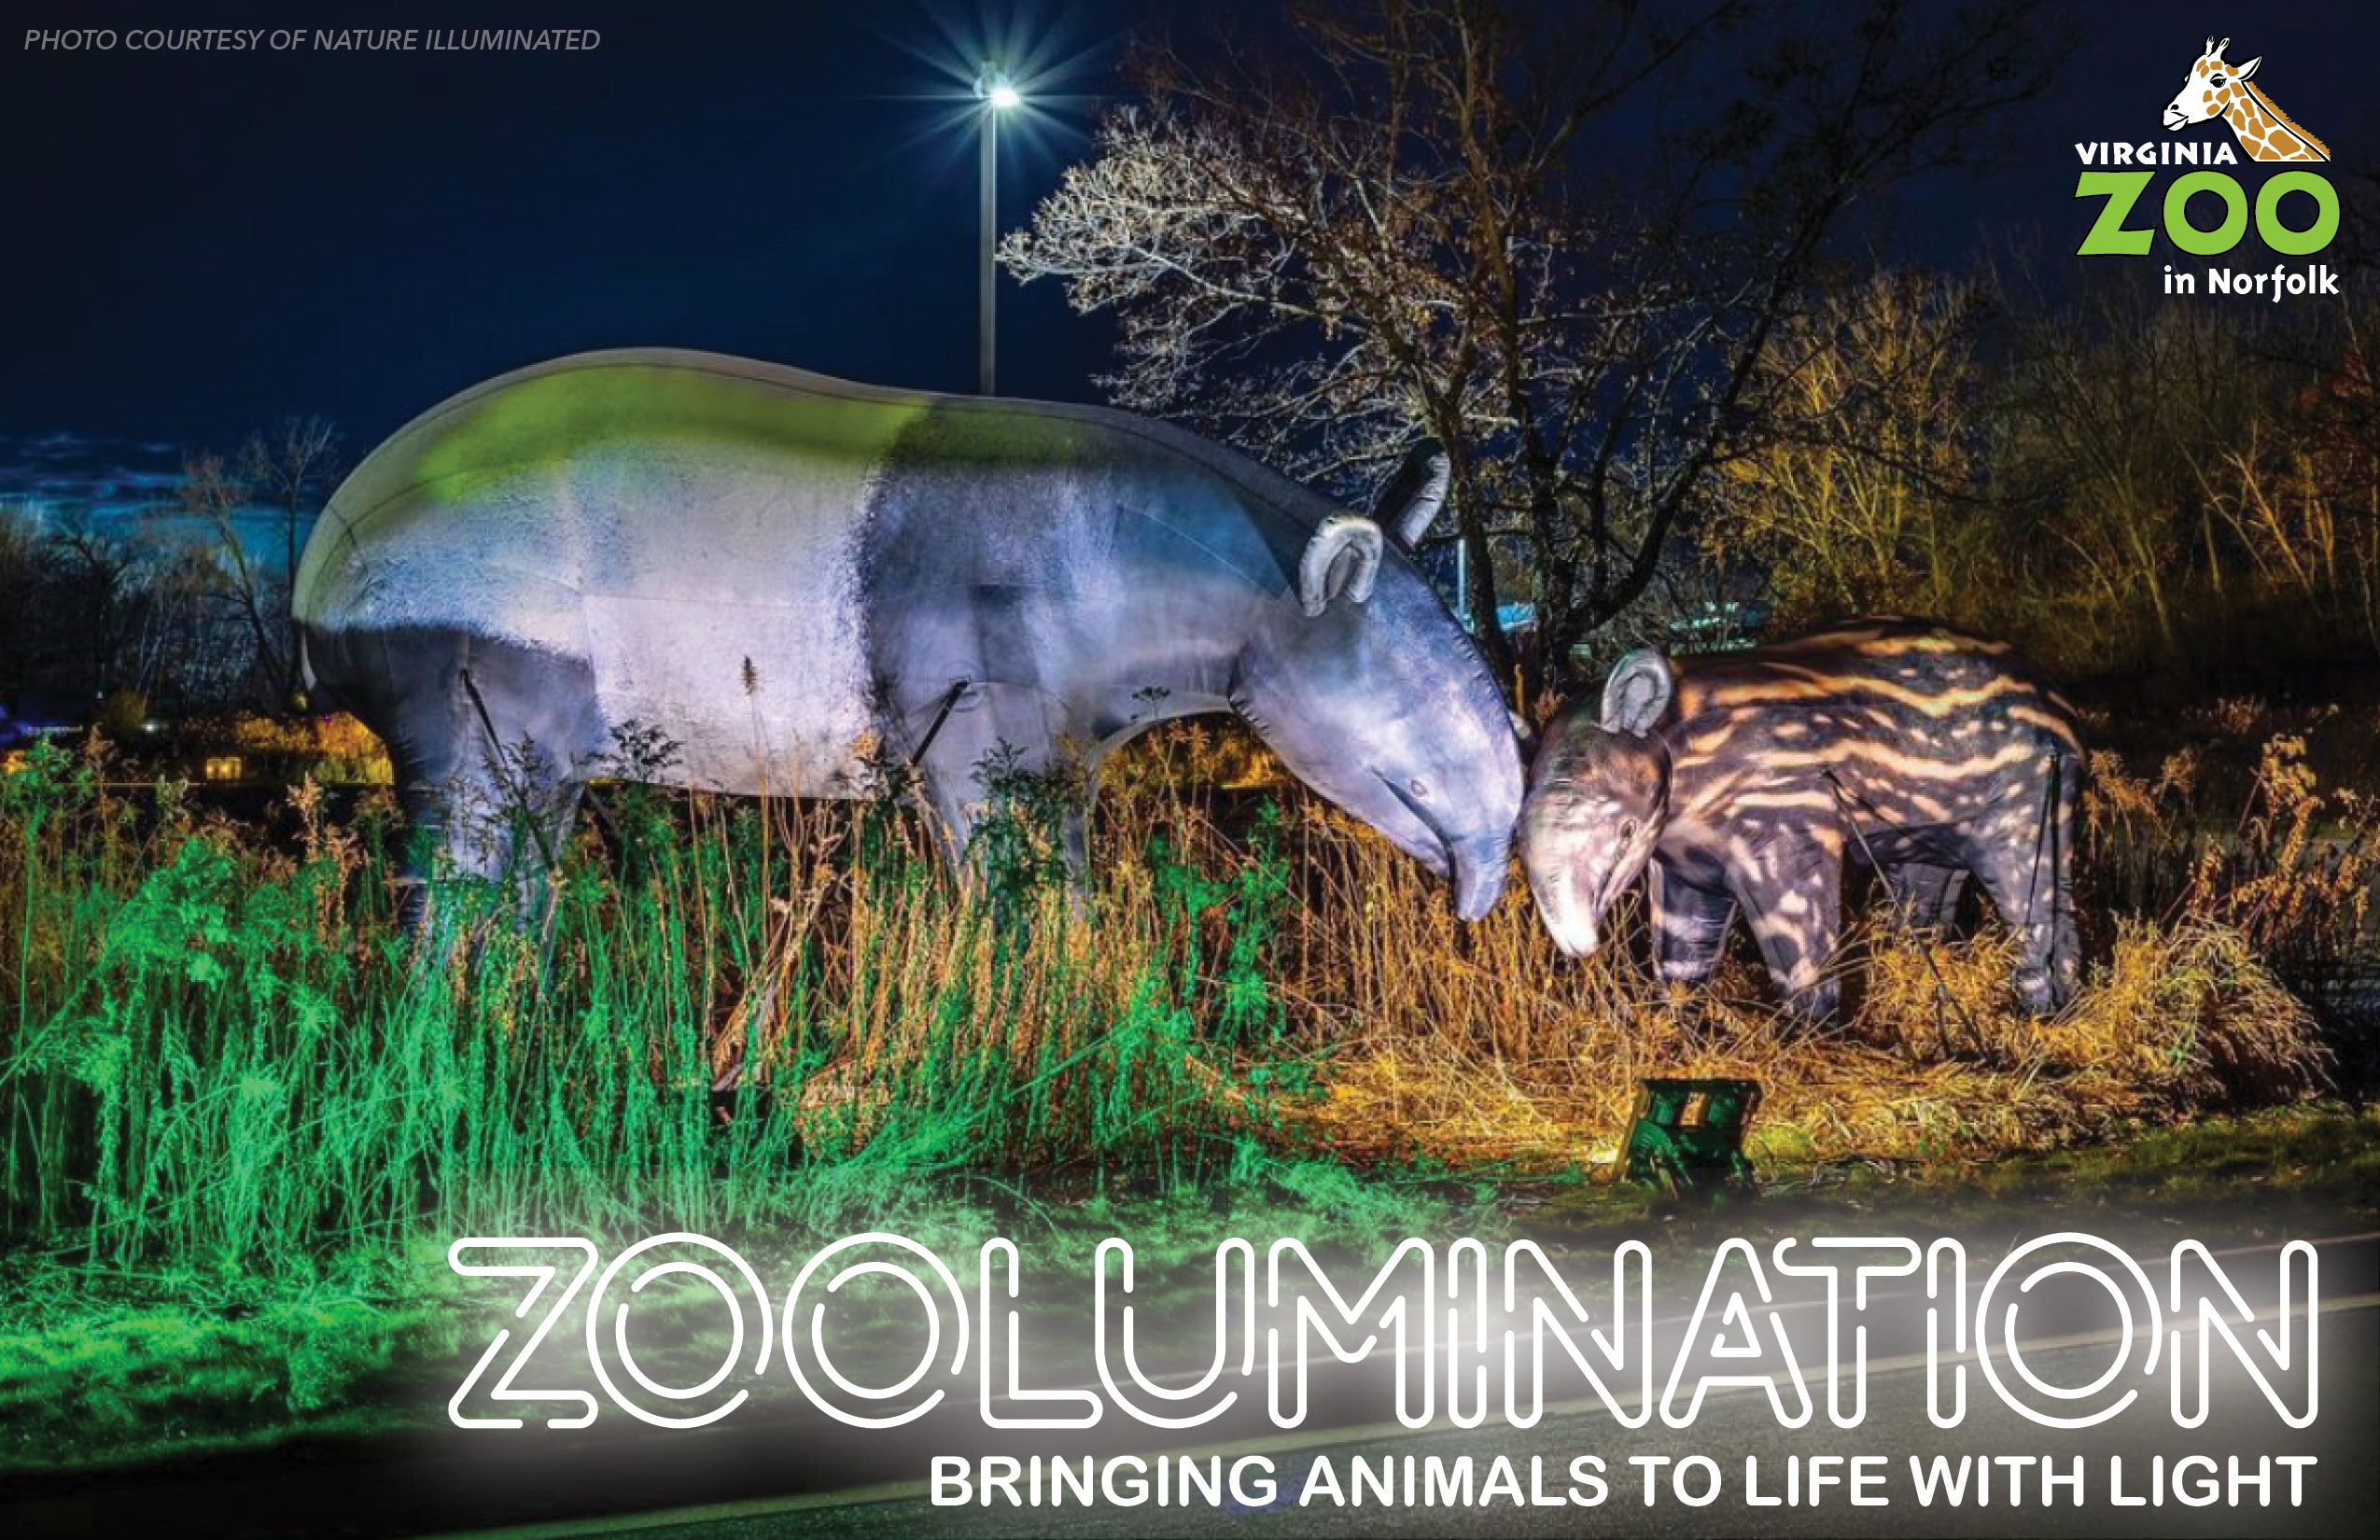 Tapir mom and calf inflatable sculpture